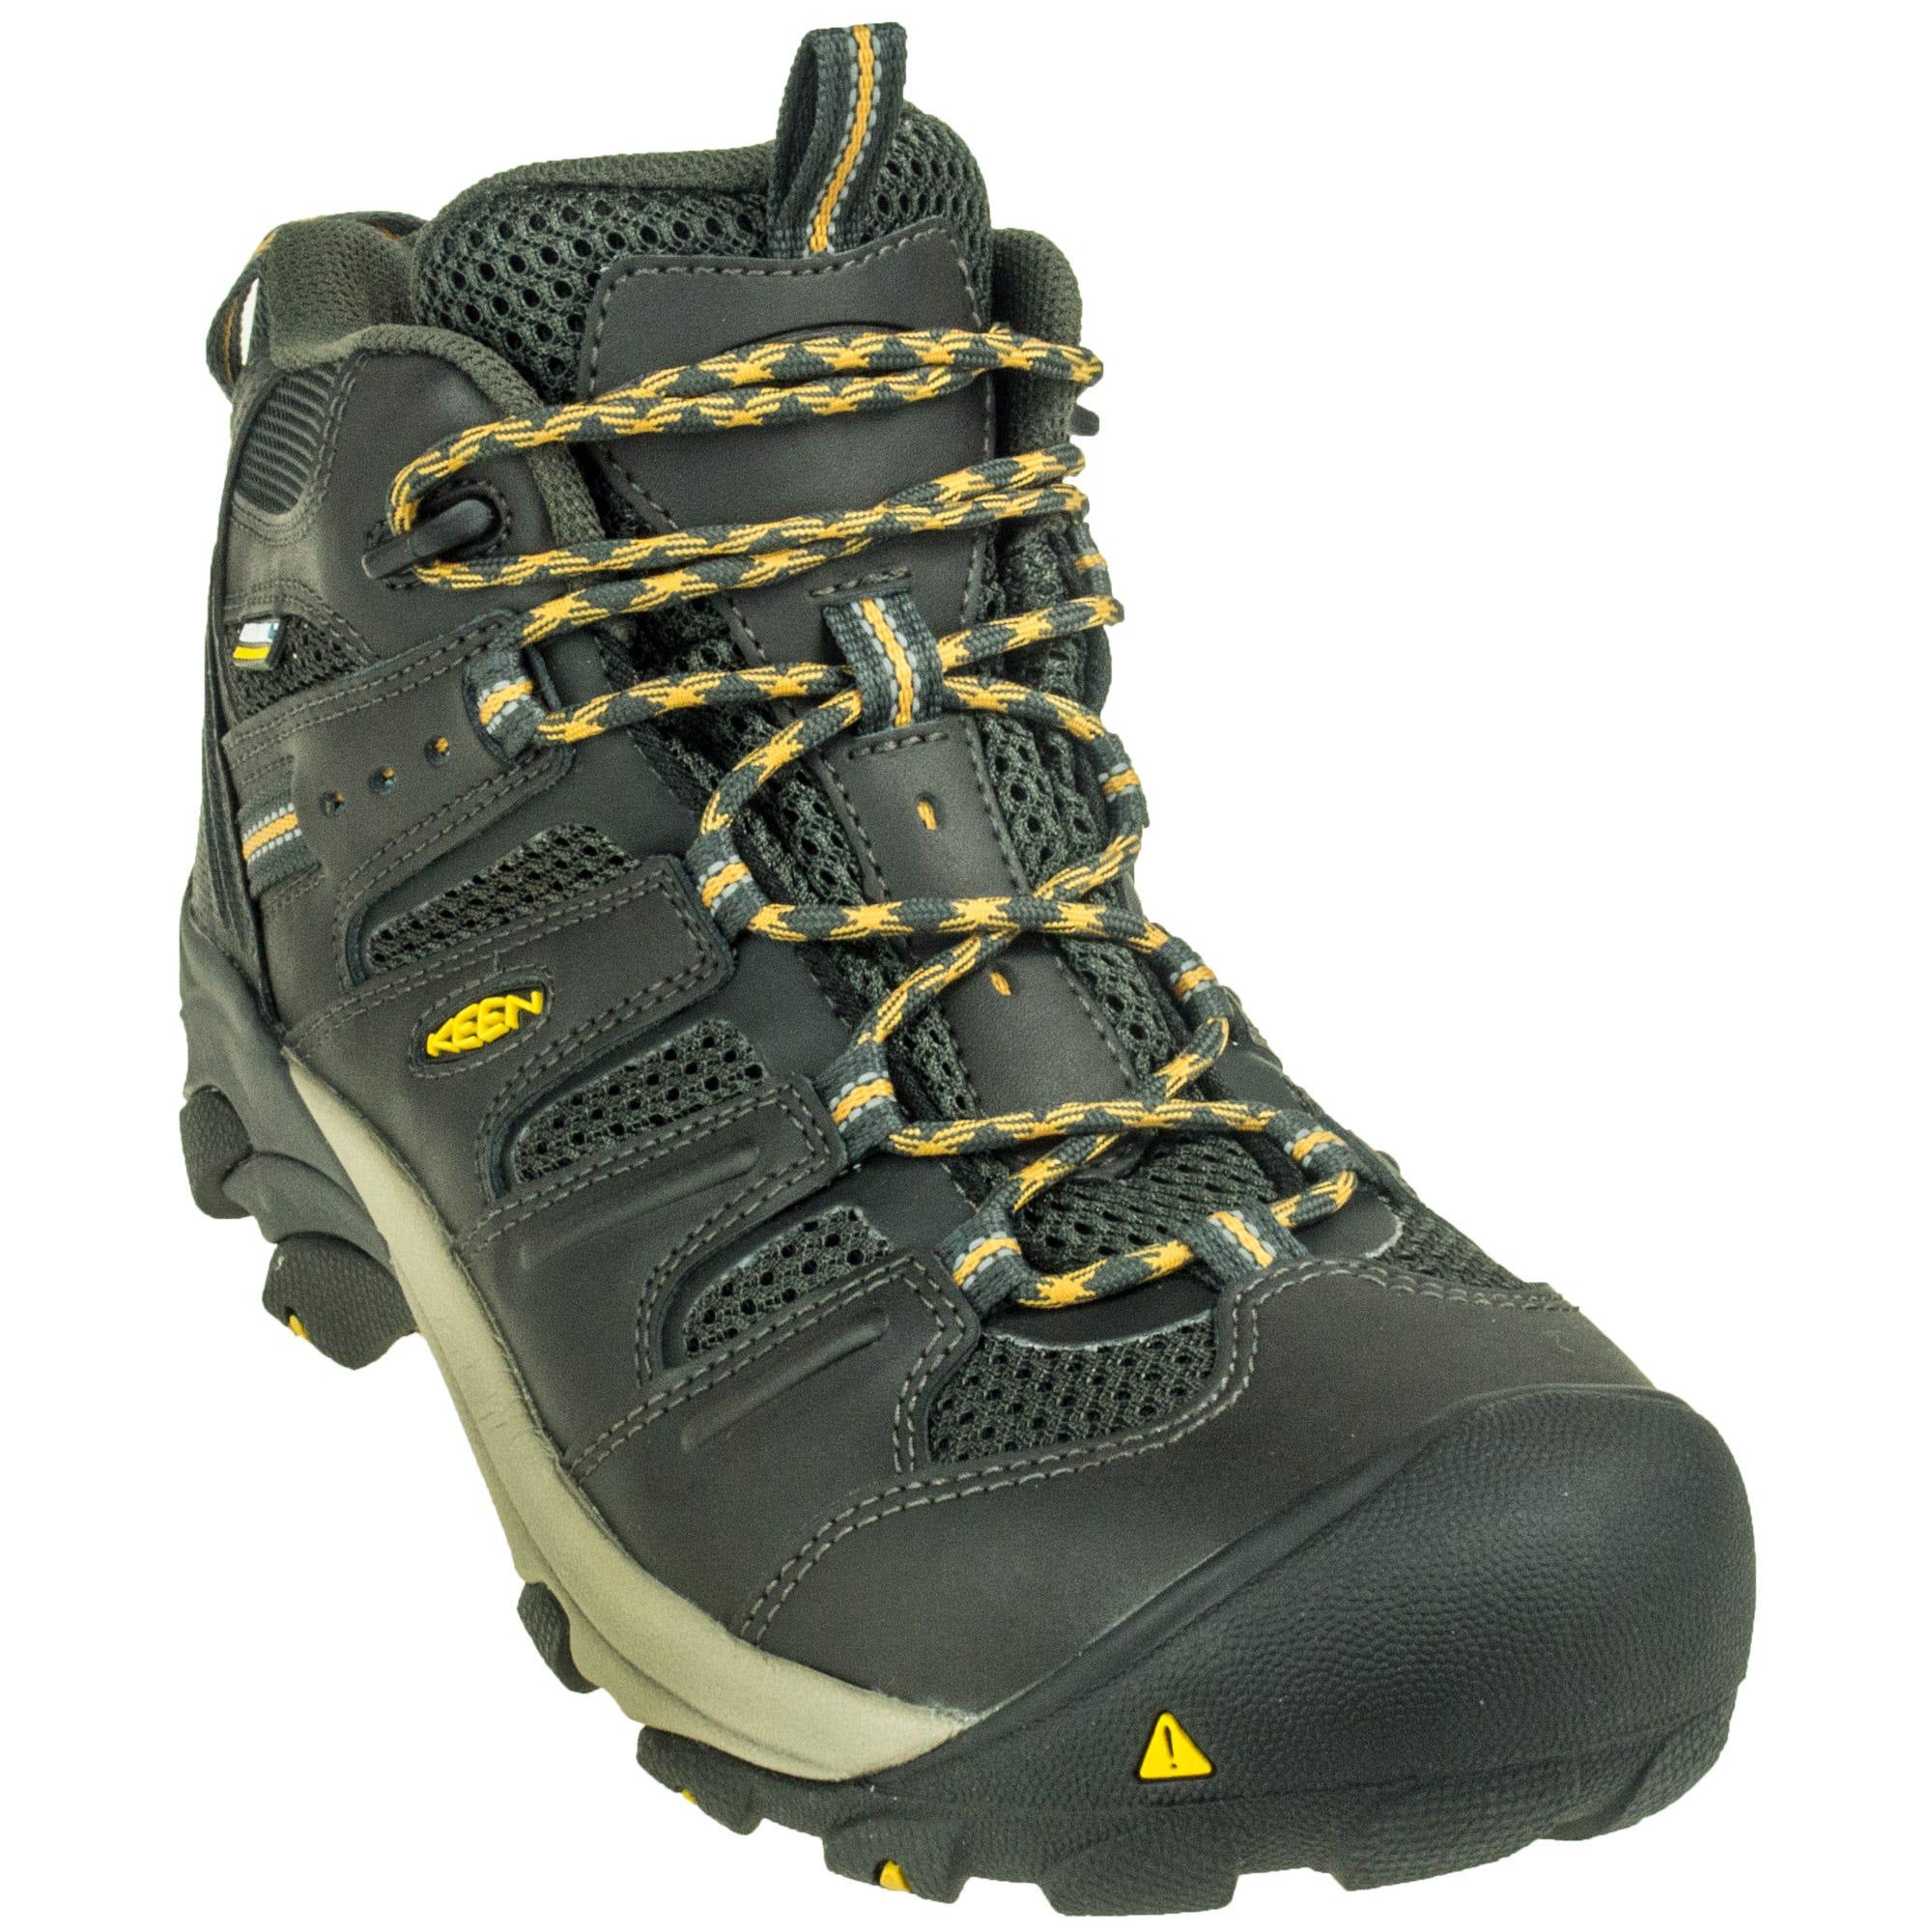 Waterproof Mid Steel Toe Work Boots